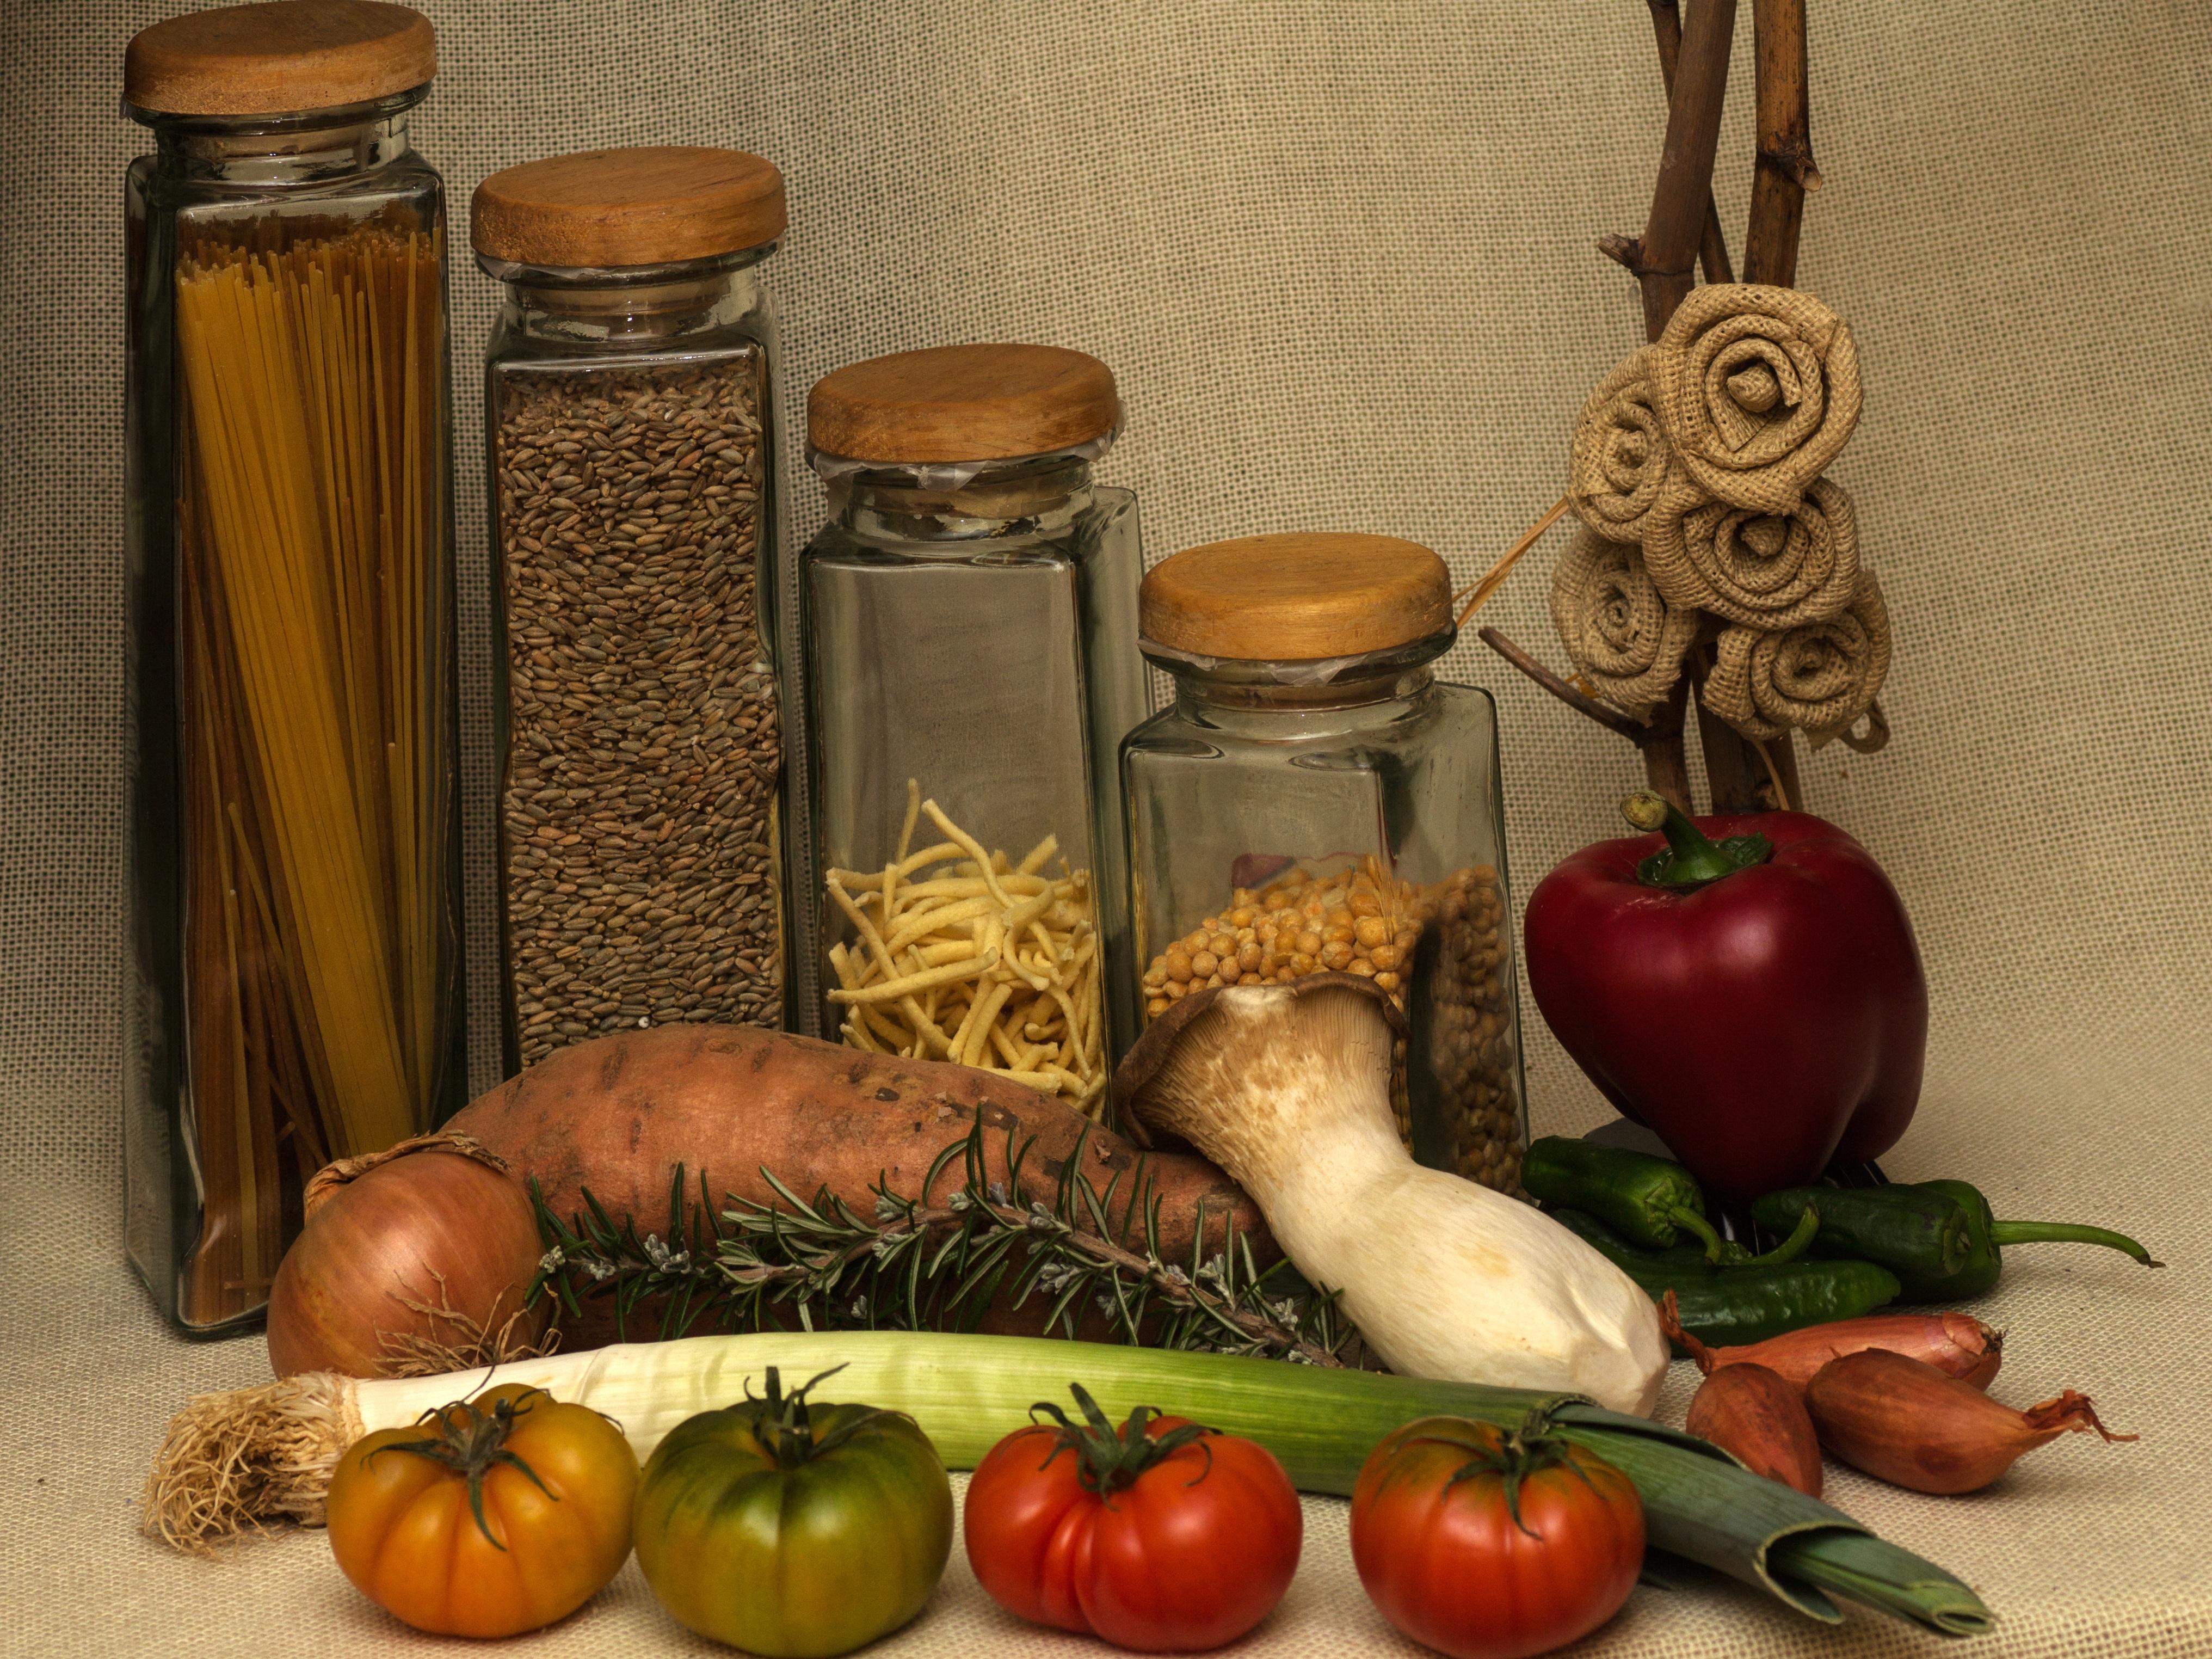 Kostenlose foto : Lebensmittel, produzieren, Gemüse, Malerei, Nudeln ...